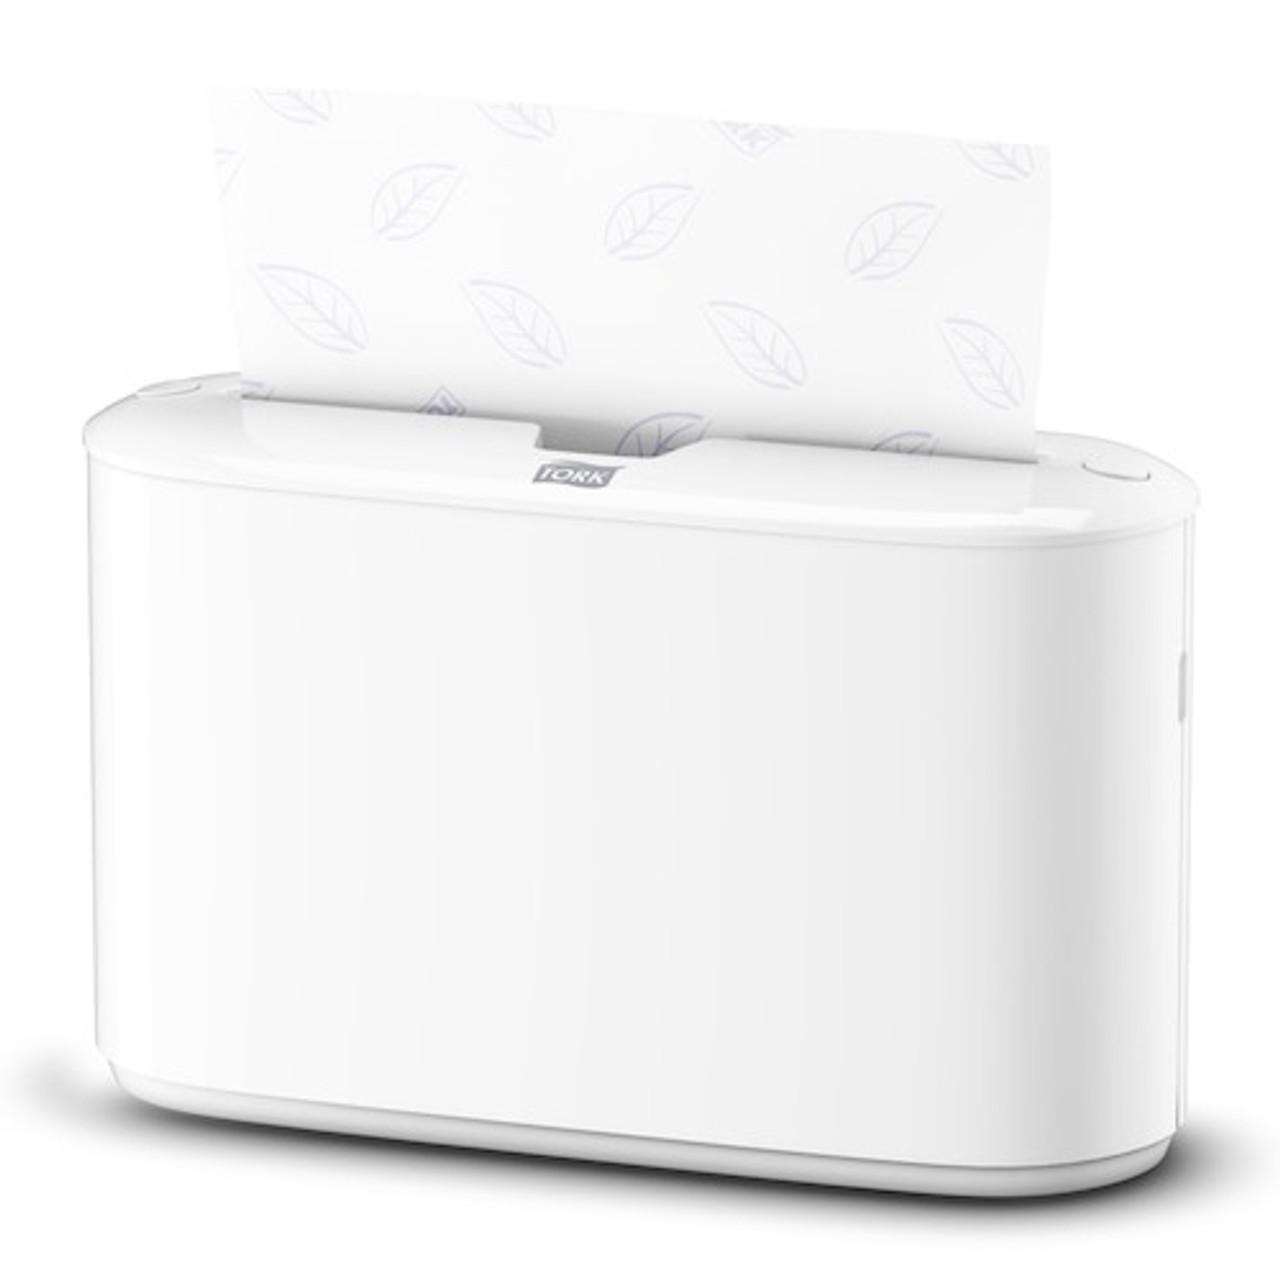 Tork Xpress Countertop Multifold Hand Towel Dispenser White (552200)